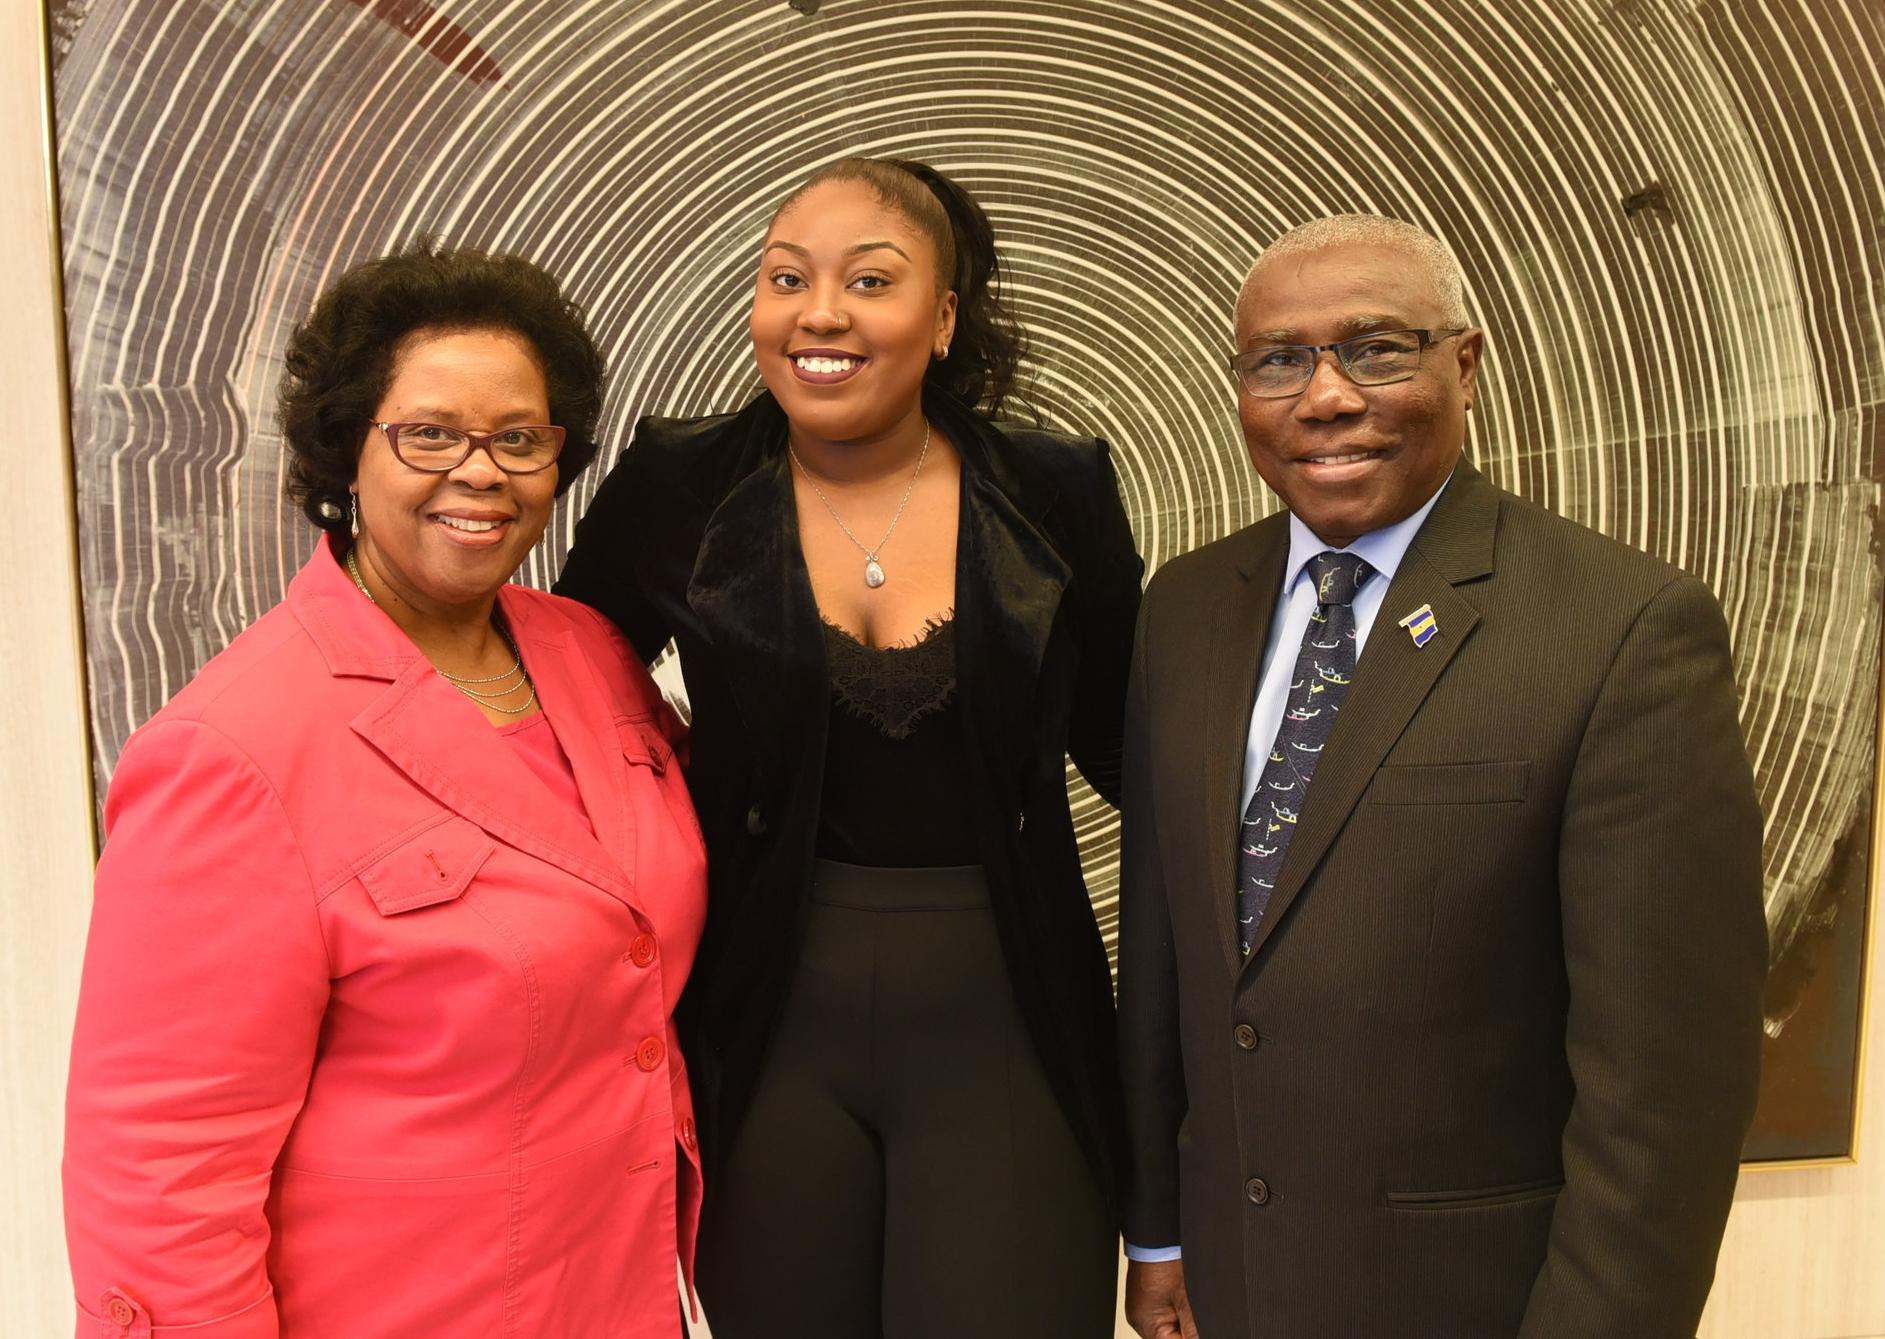 Scholarship recipient Shaquel Sealy with Barbados consul general Haynesley Benn and scholarship program chair Penny Walcott